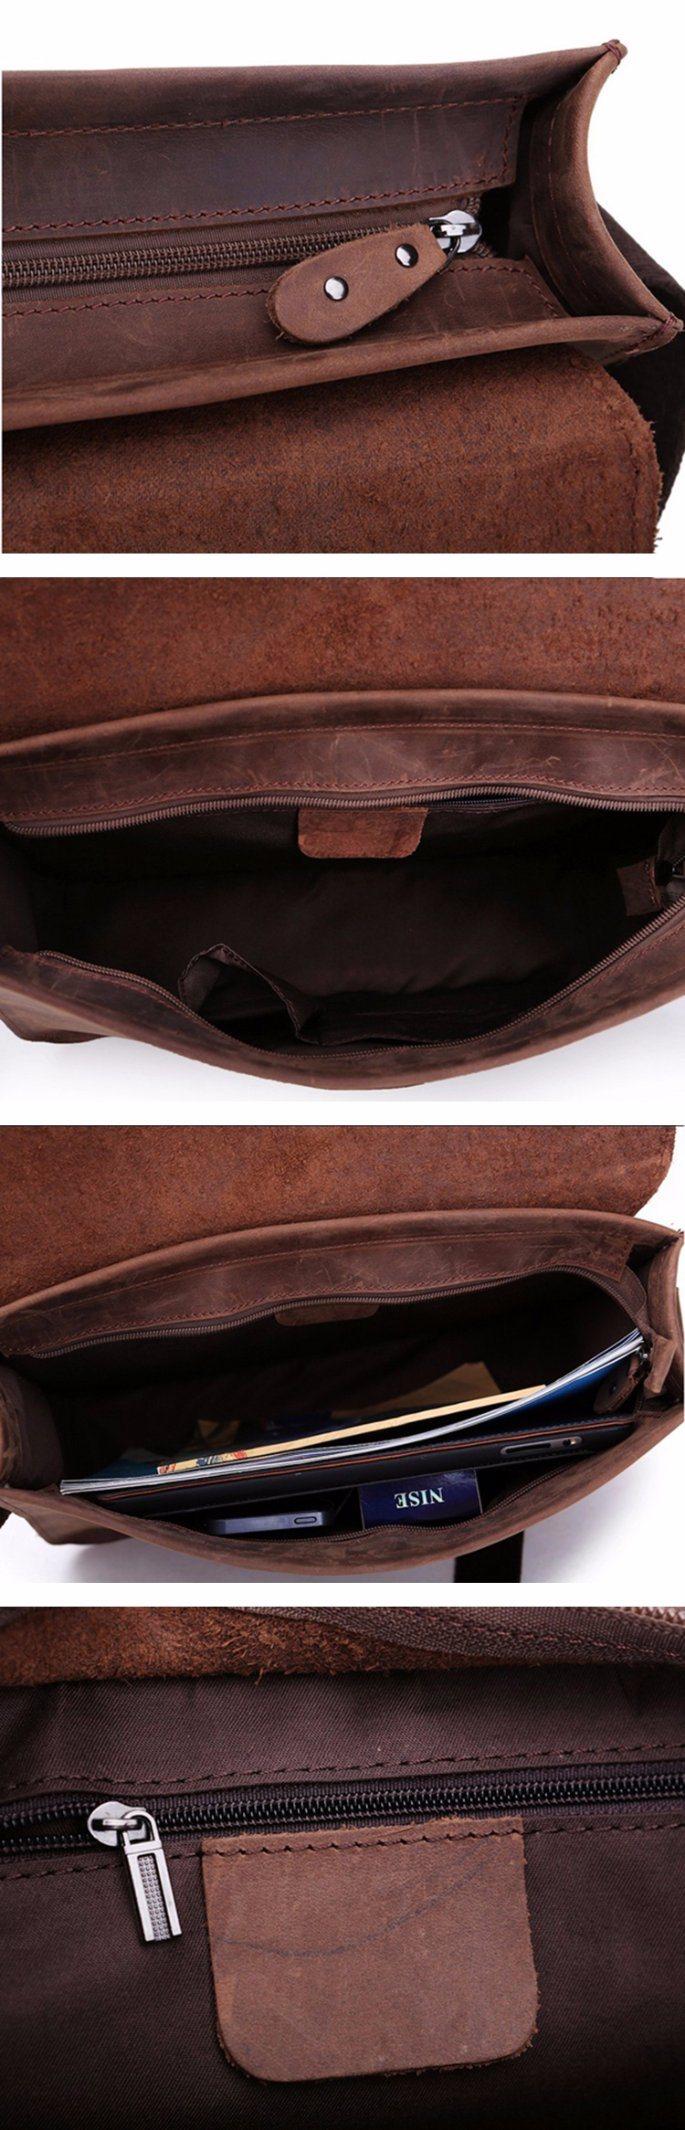 Hot Selling Good Quality Brown Crazy Horse Leather Bag Messenger for Men